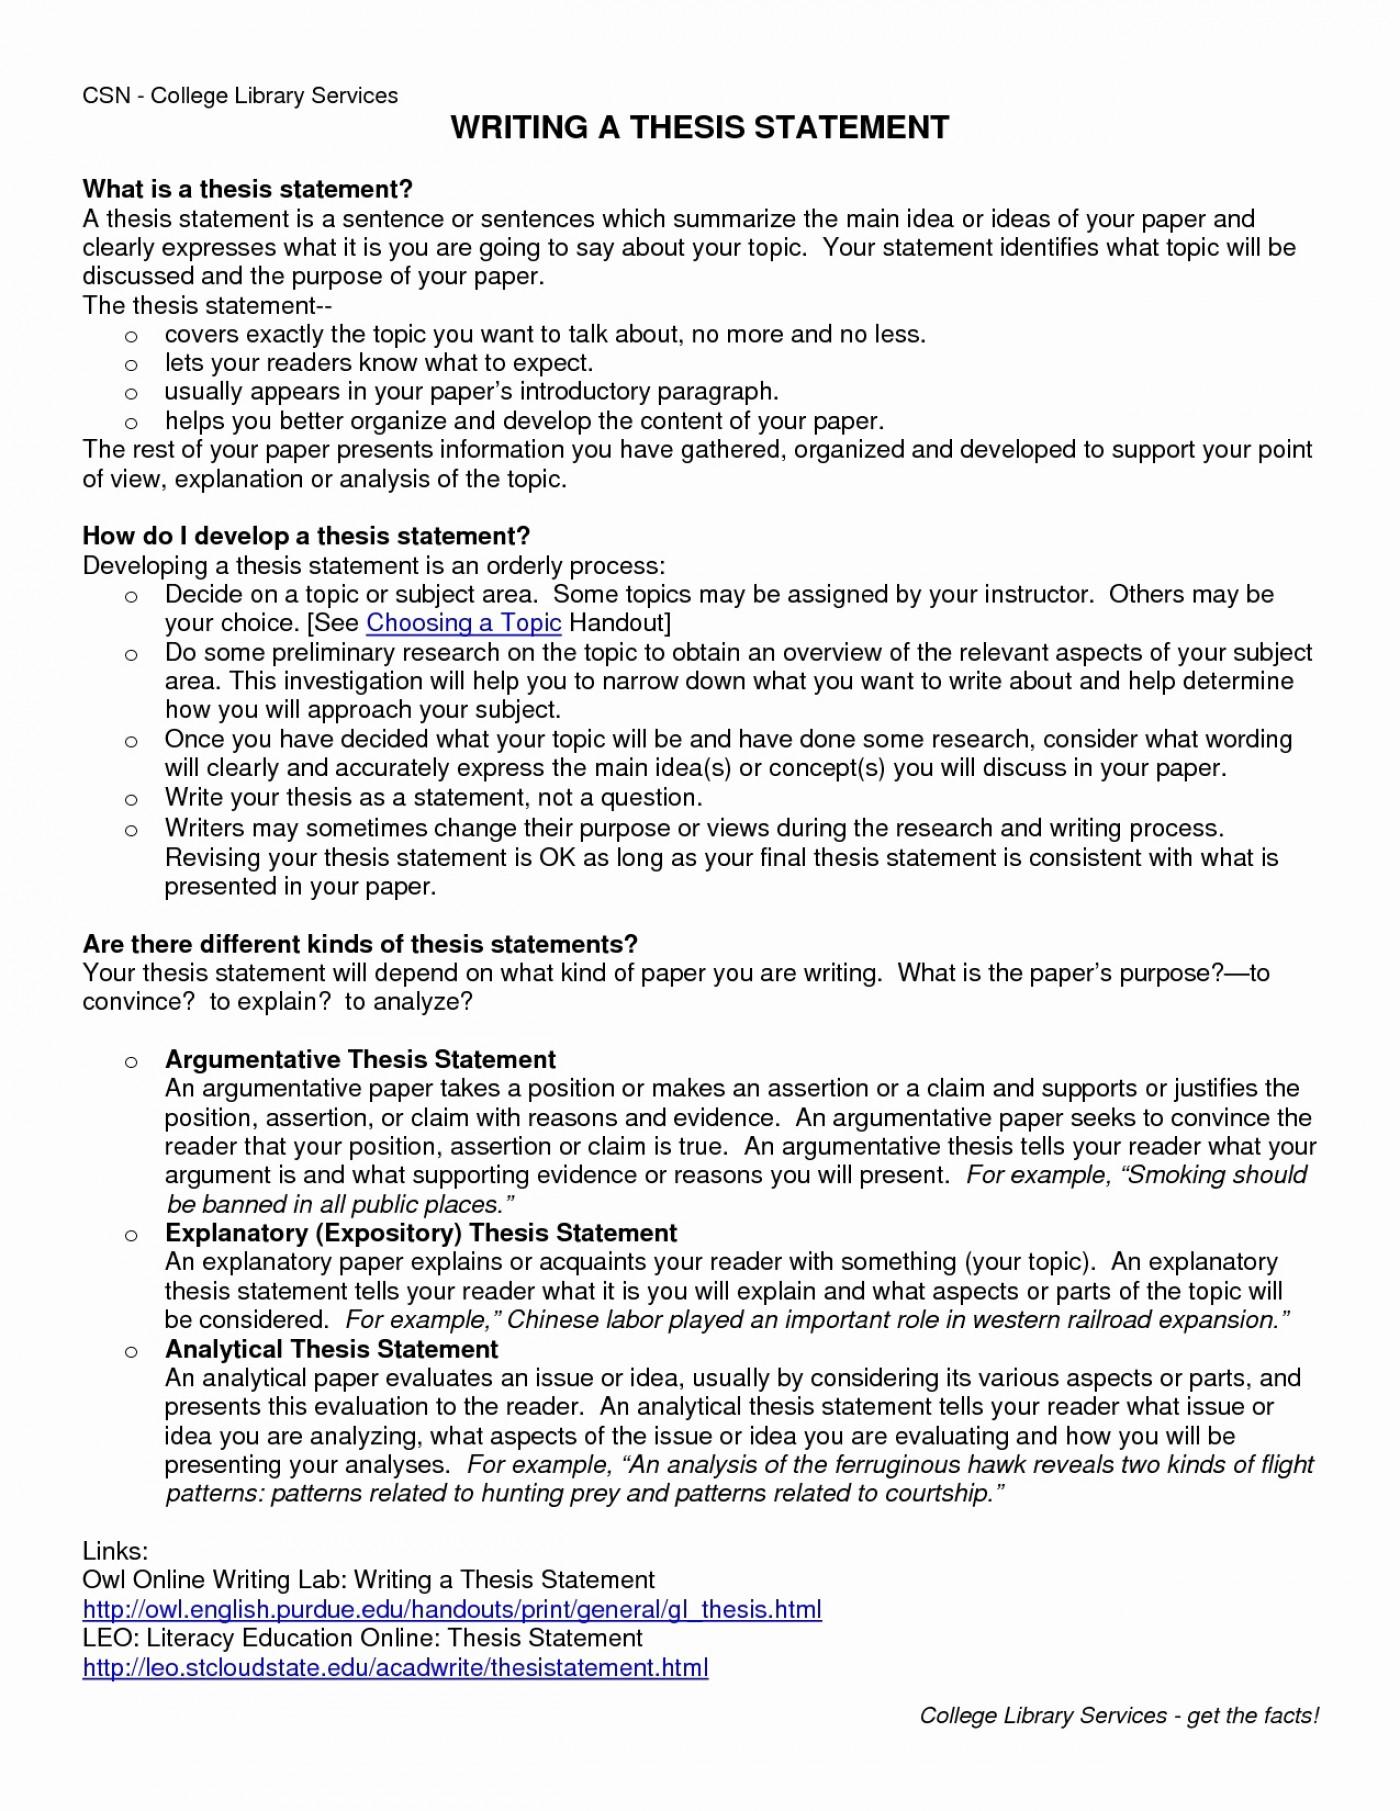 Phd thesis on economic development